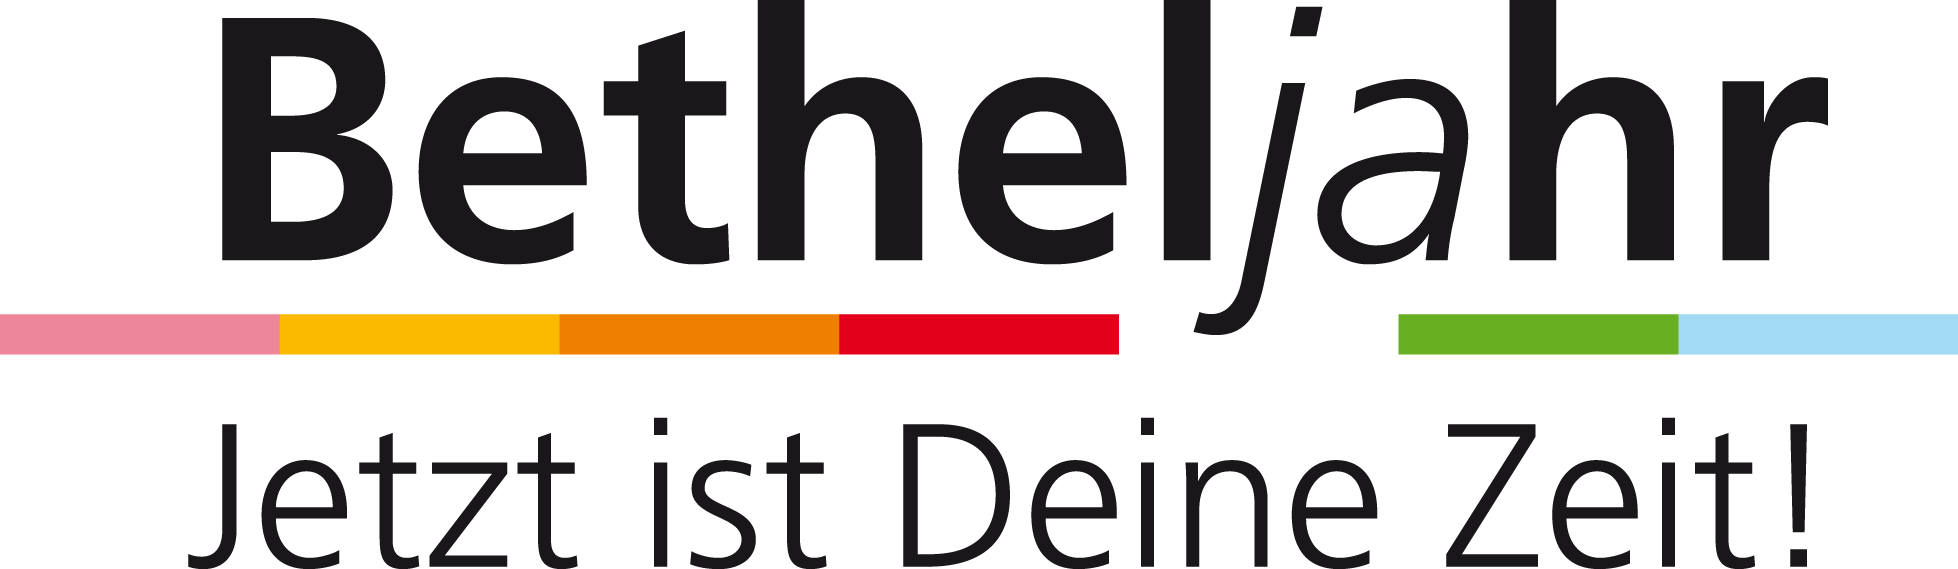 Betheljahr